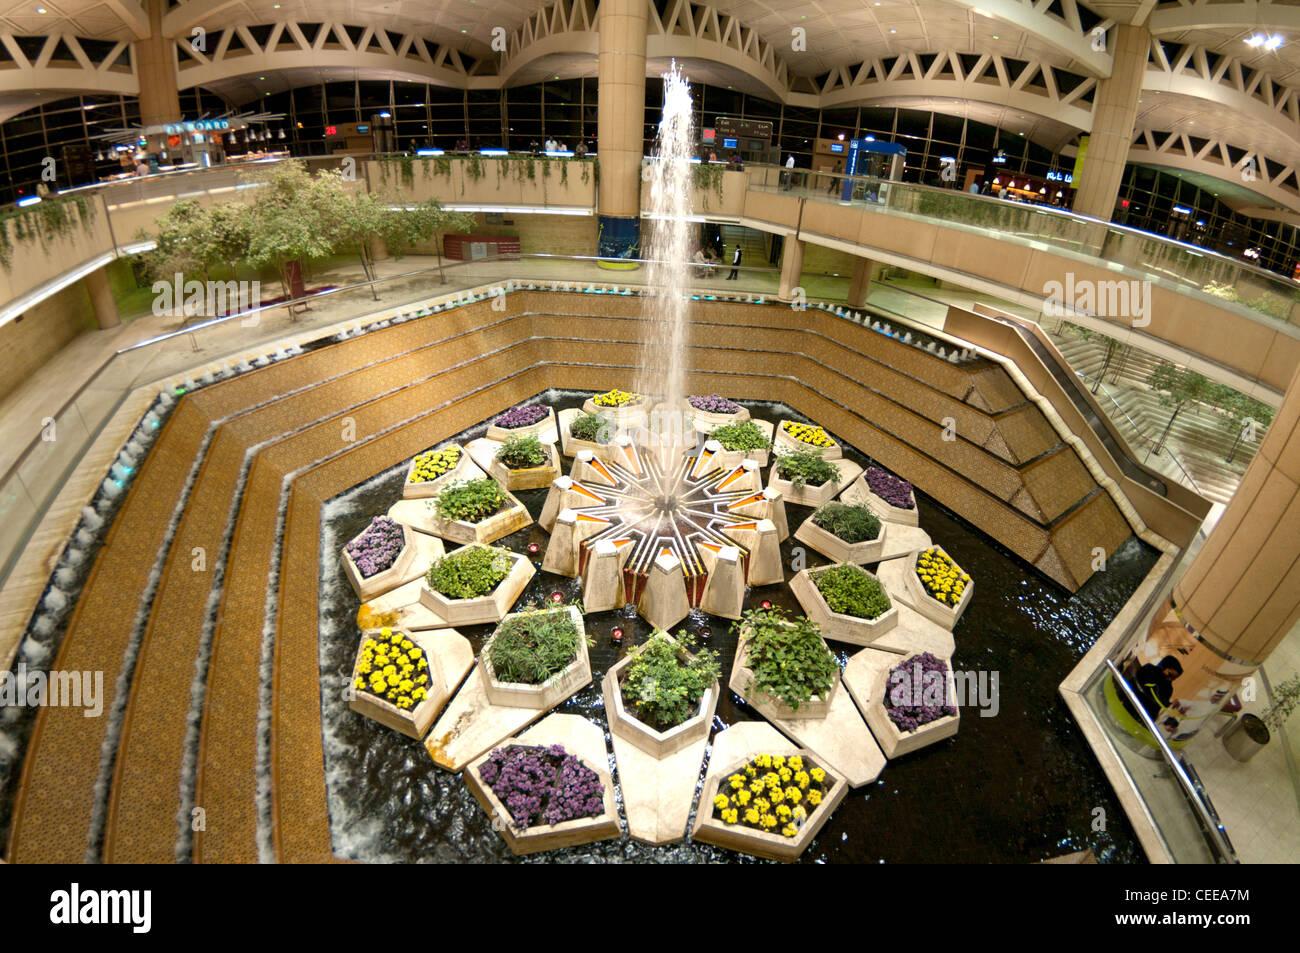 a fountain at the King Khaled Airport in Riyadh, Saudi Arabia - Stock Image